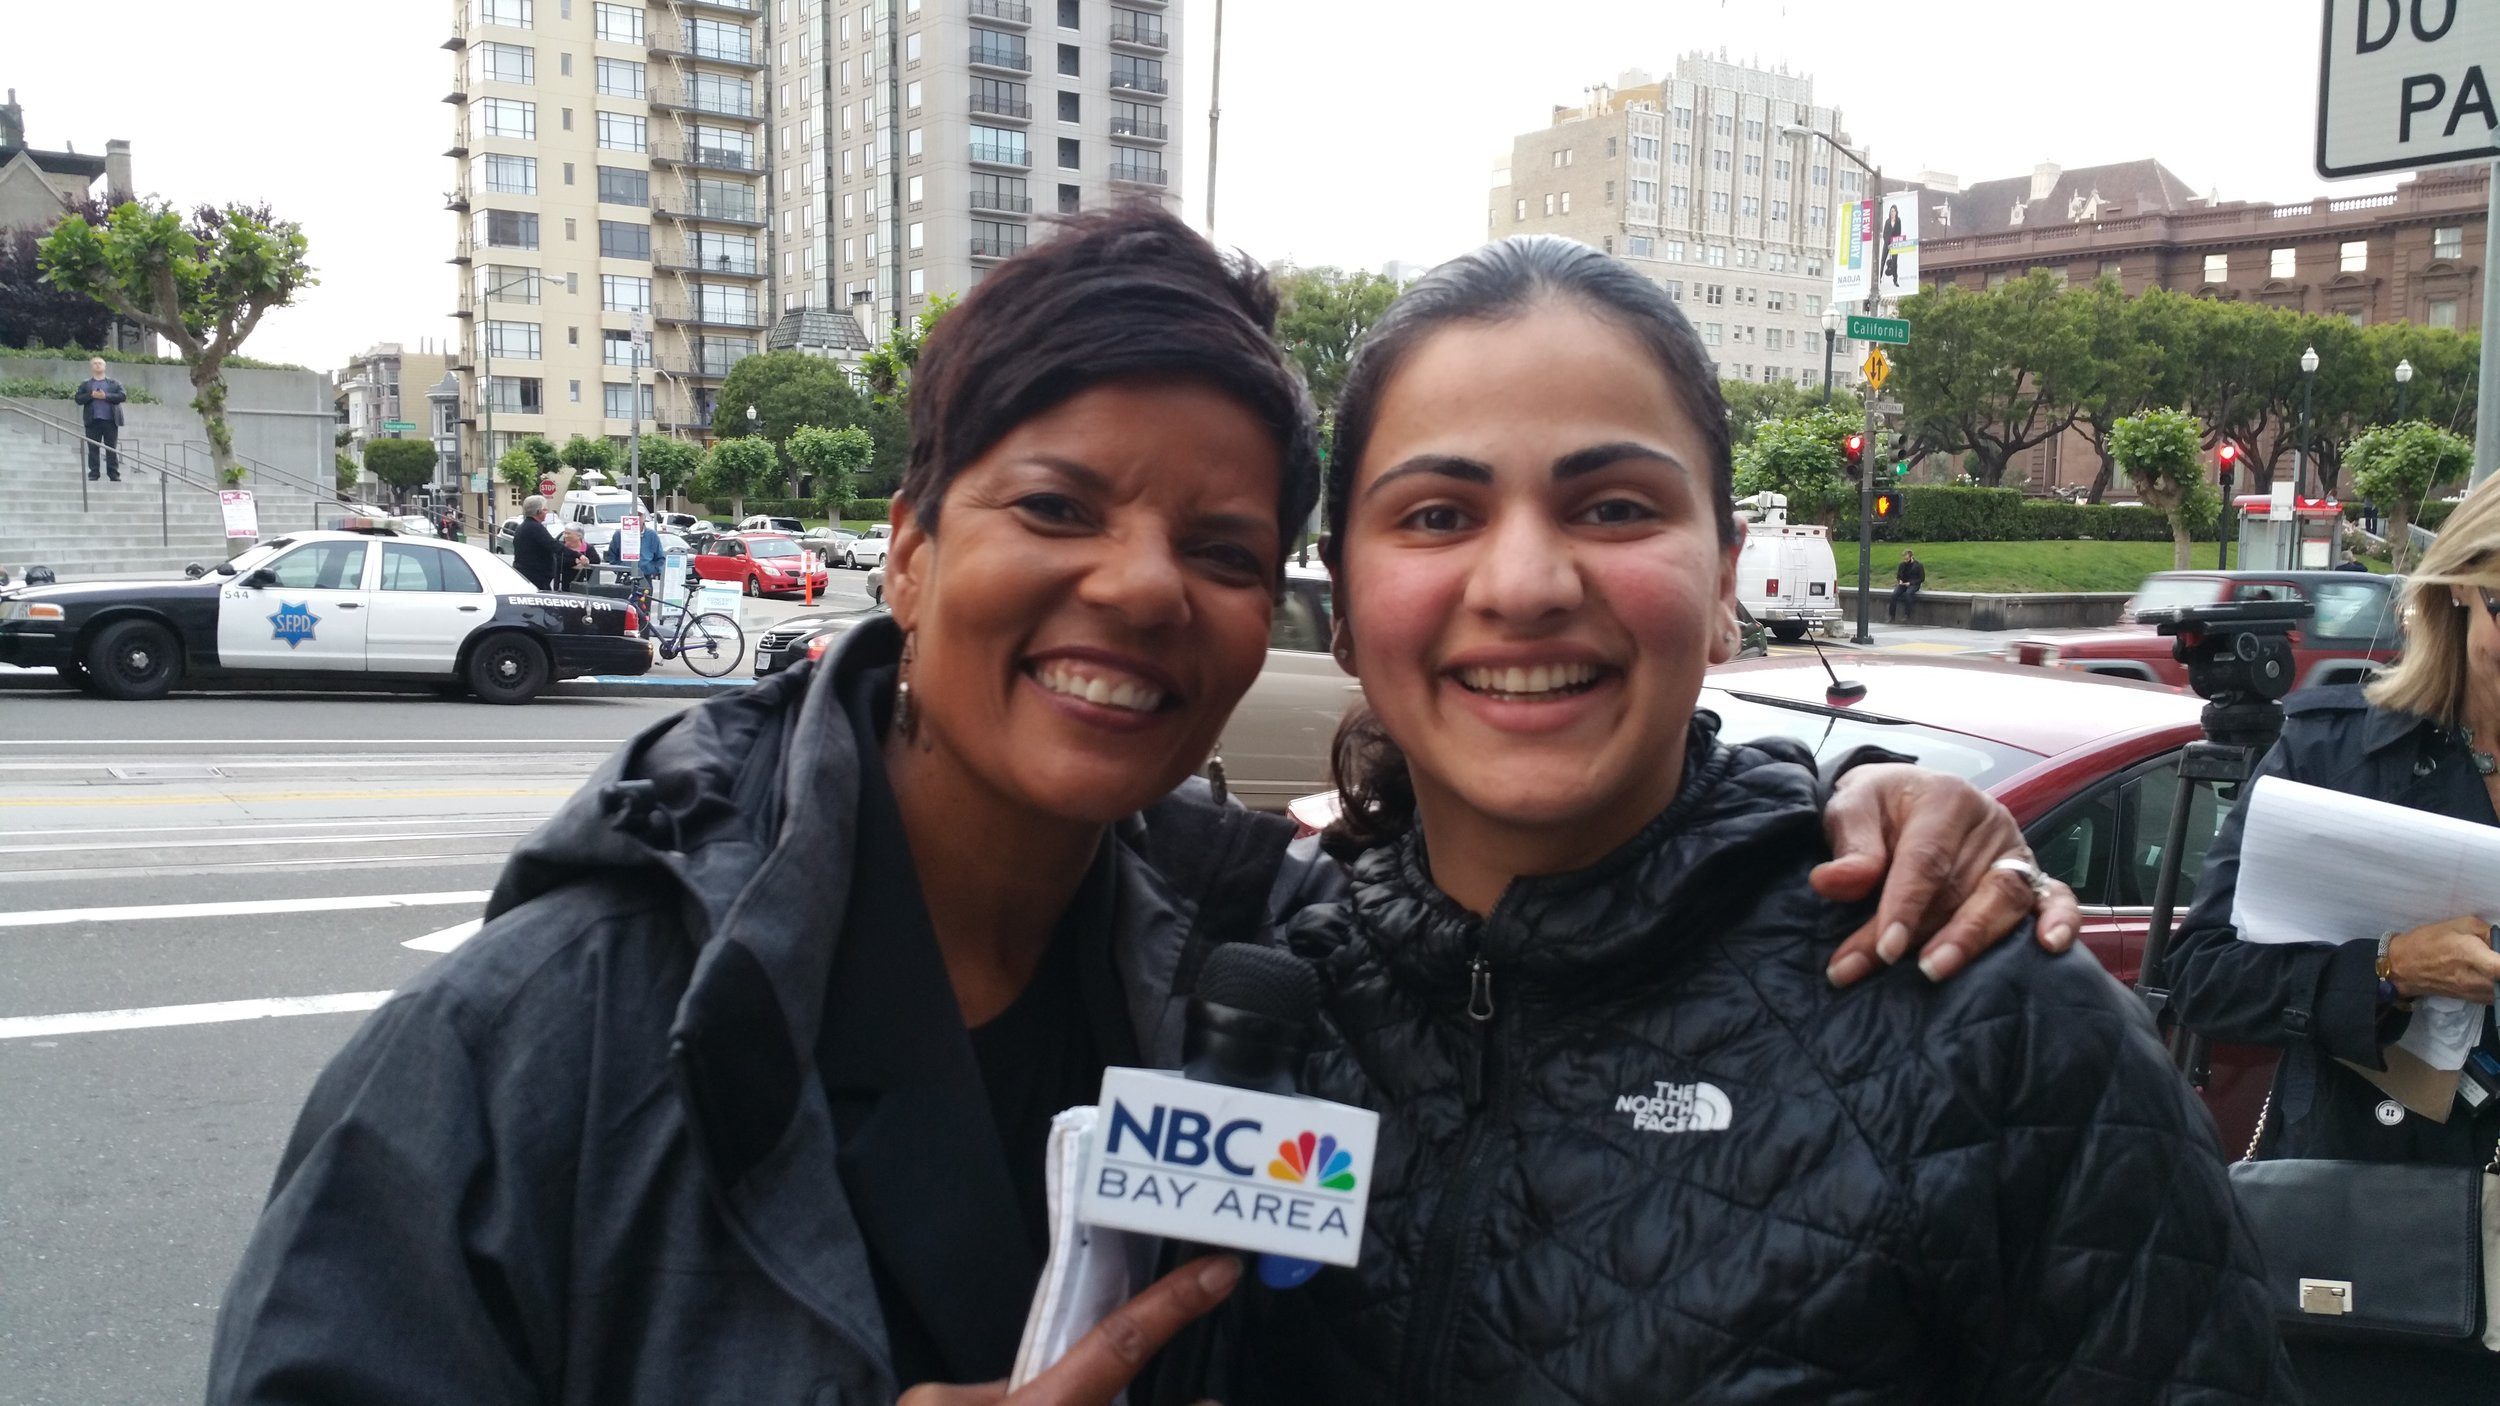 NBC Reporter Cheryl Hurd & Aisha